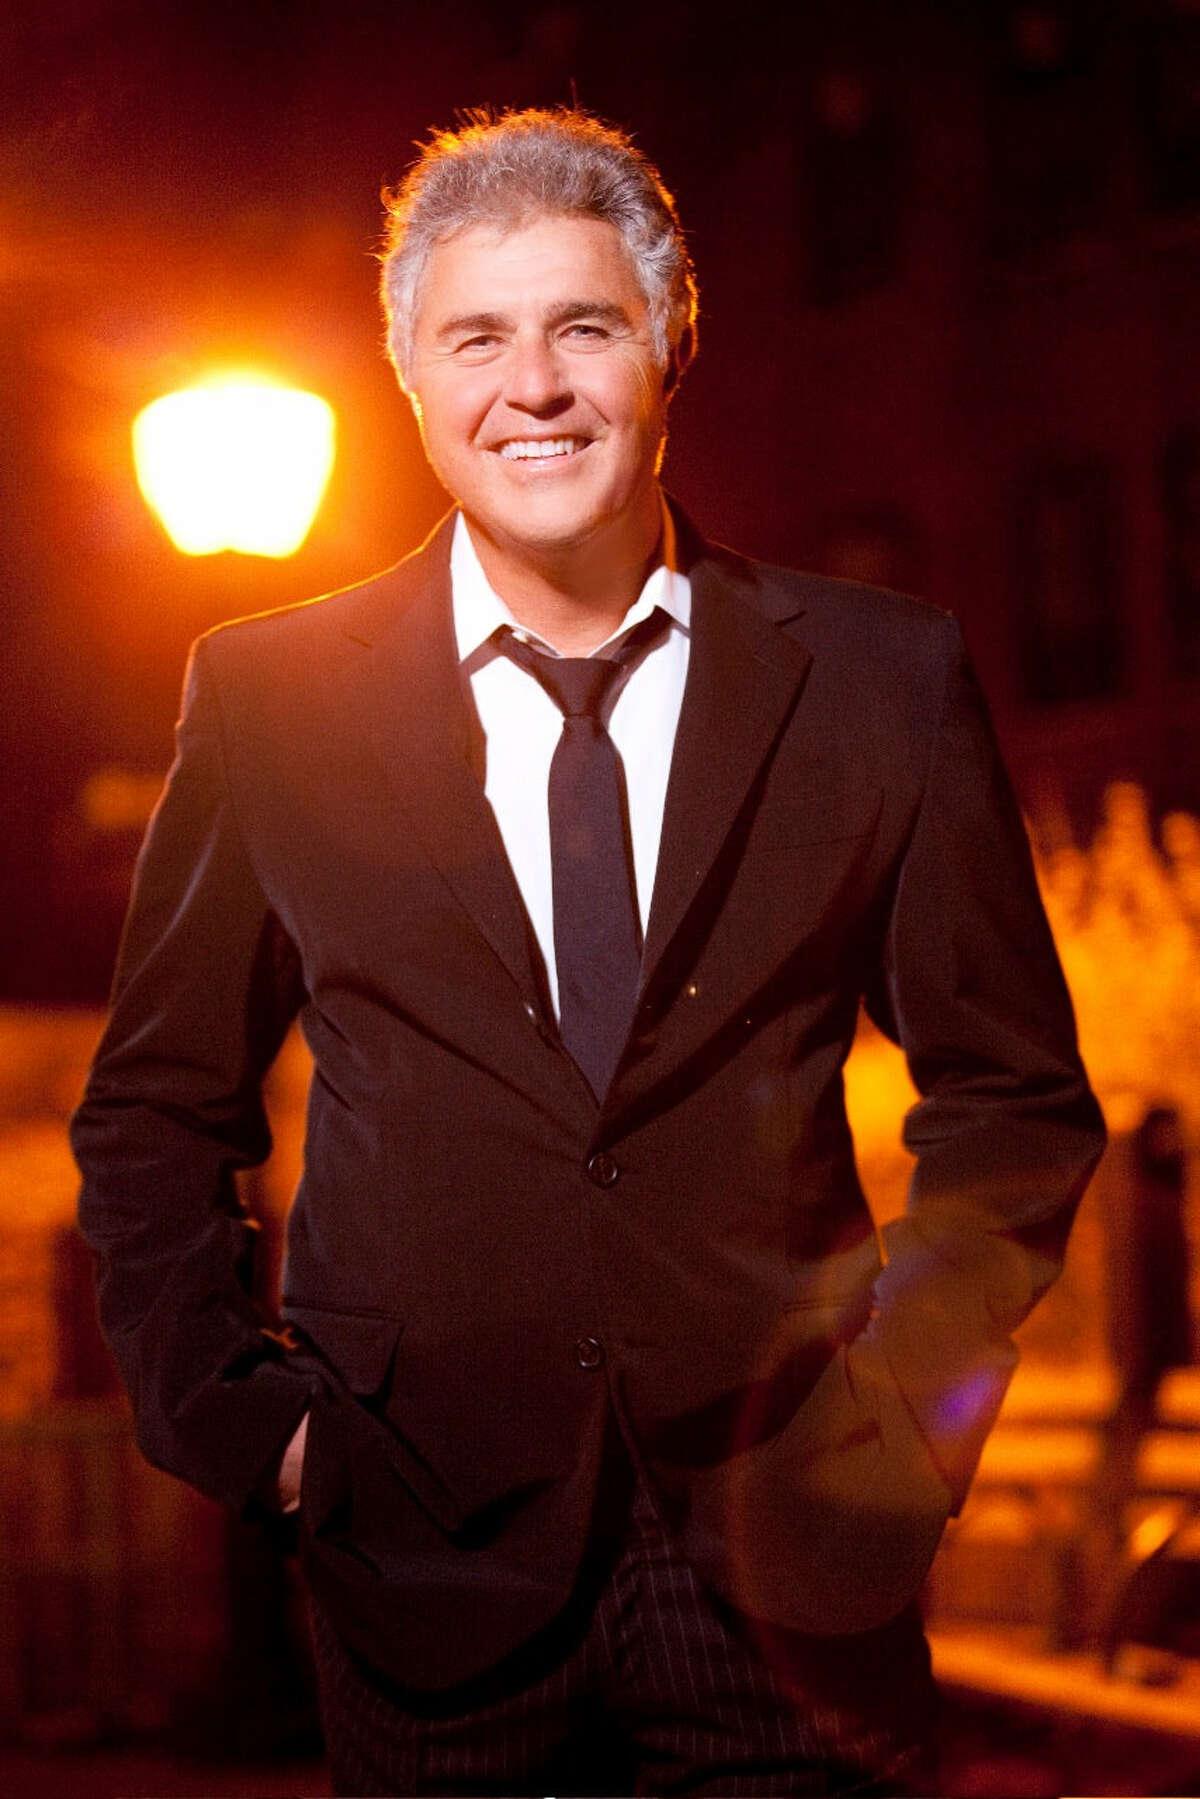 image of singer Steve Tyrell credit: Tina Tyrell